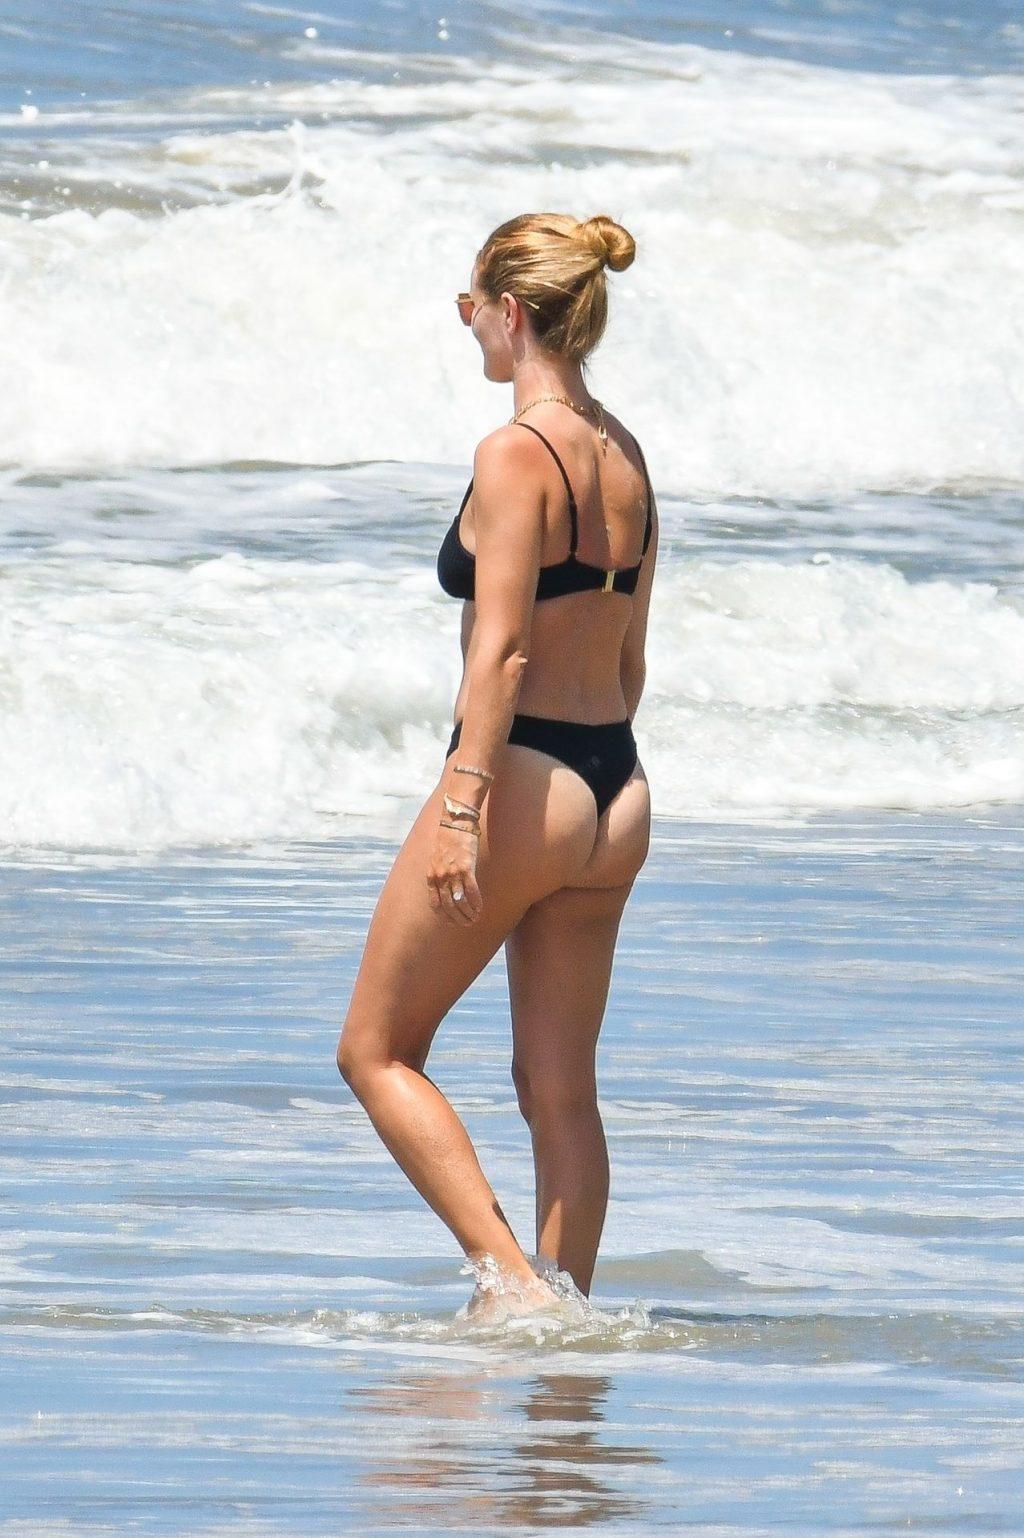 Rosie Huntington-Whiteley & Jason Statham Enjoy a Day on the Beach (70 Photos)